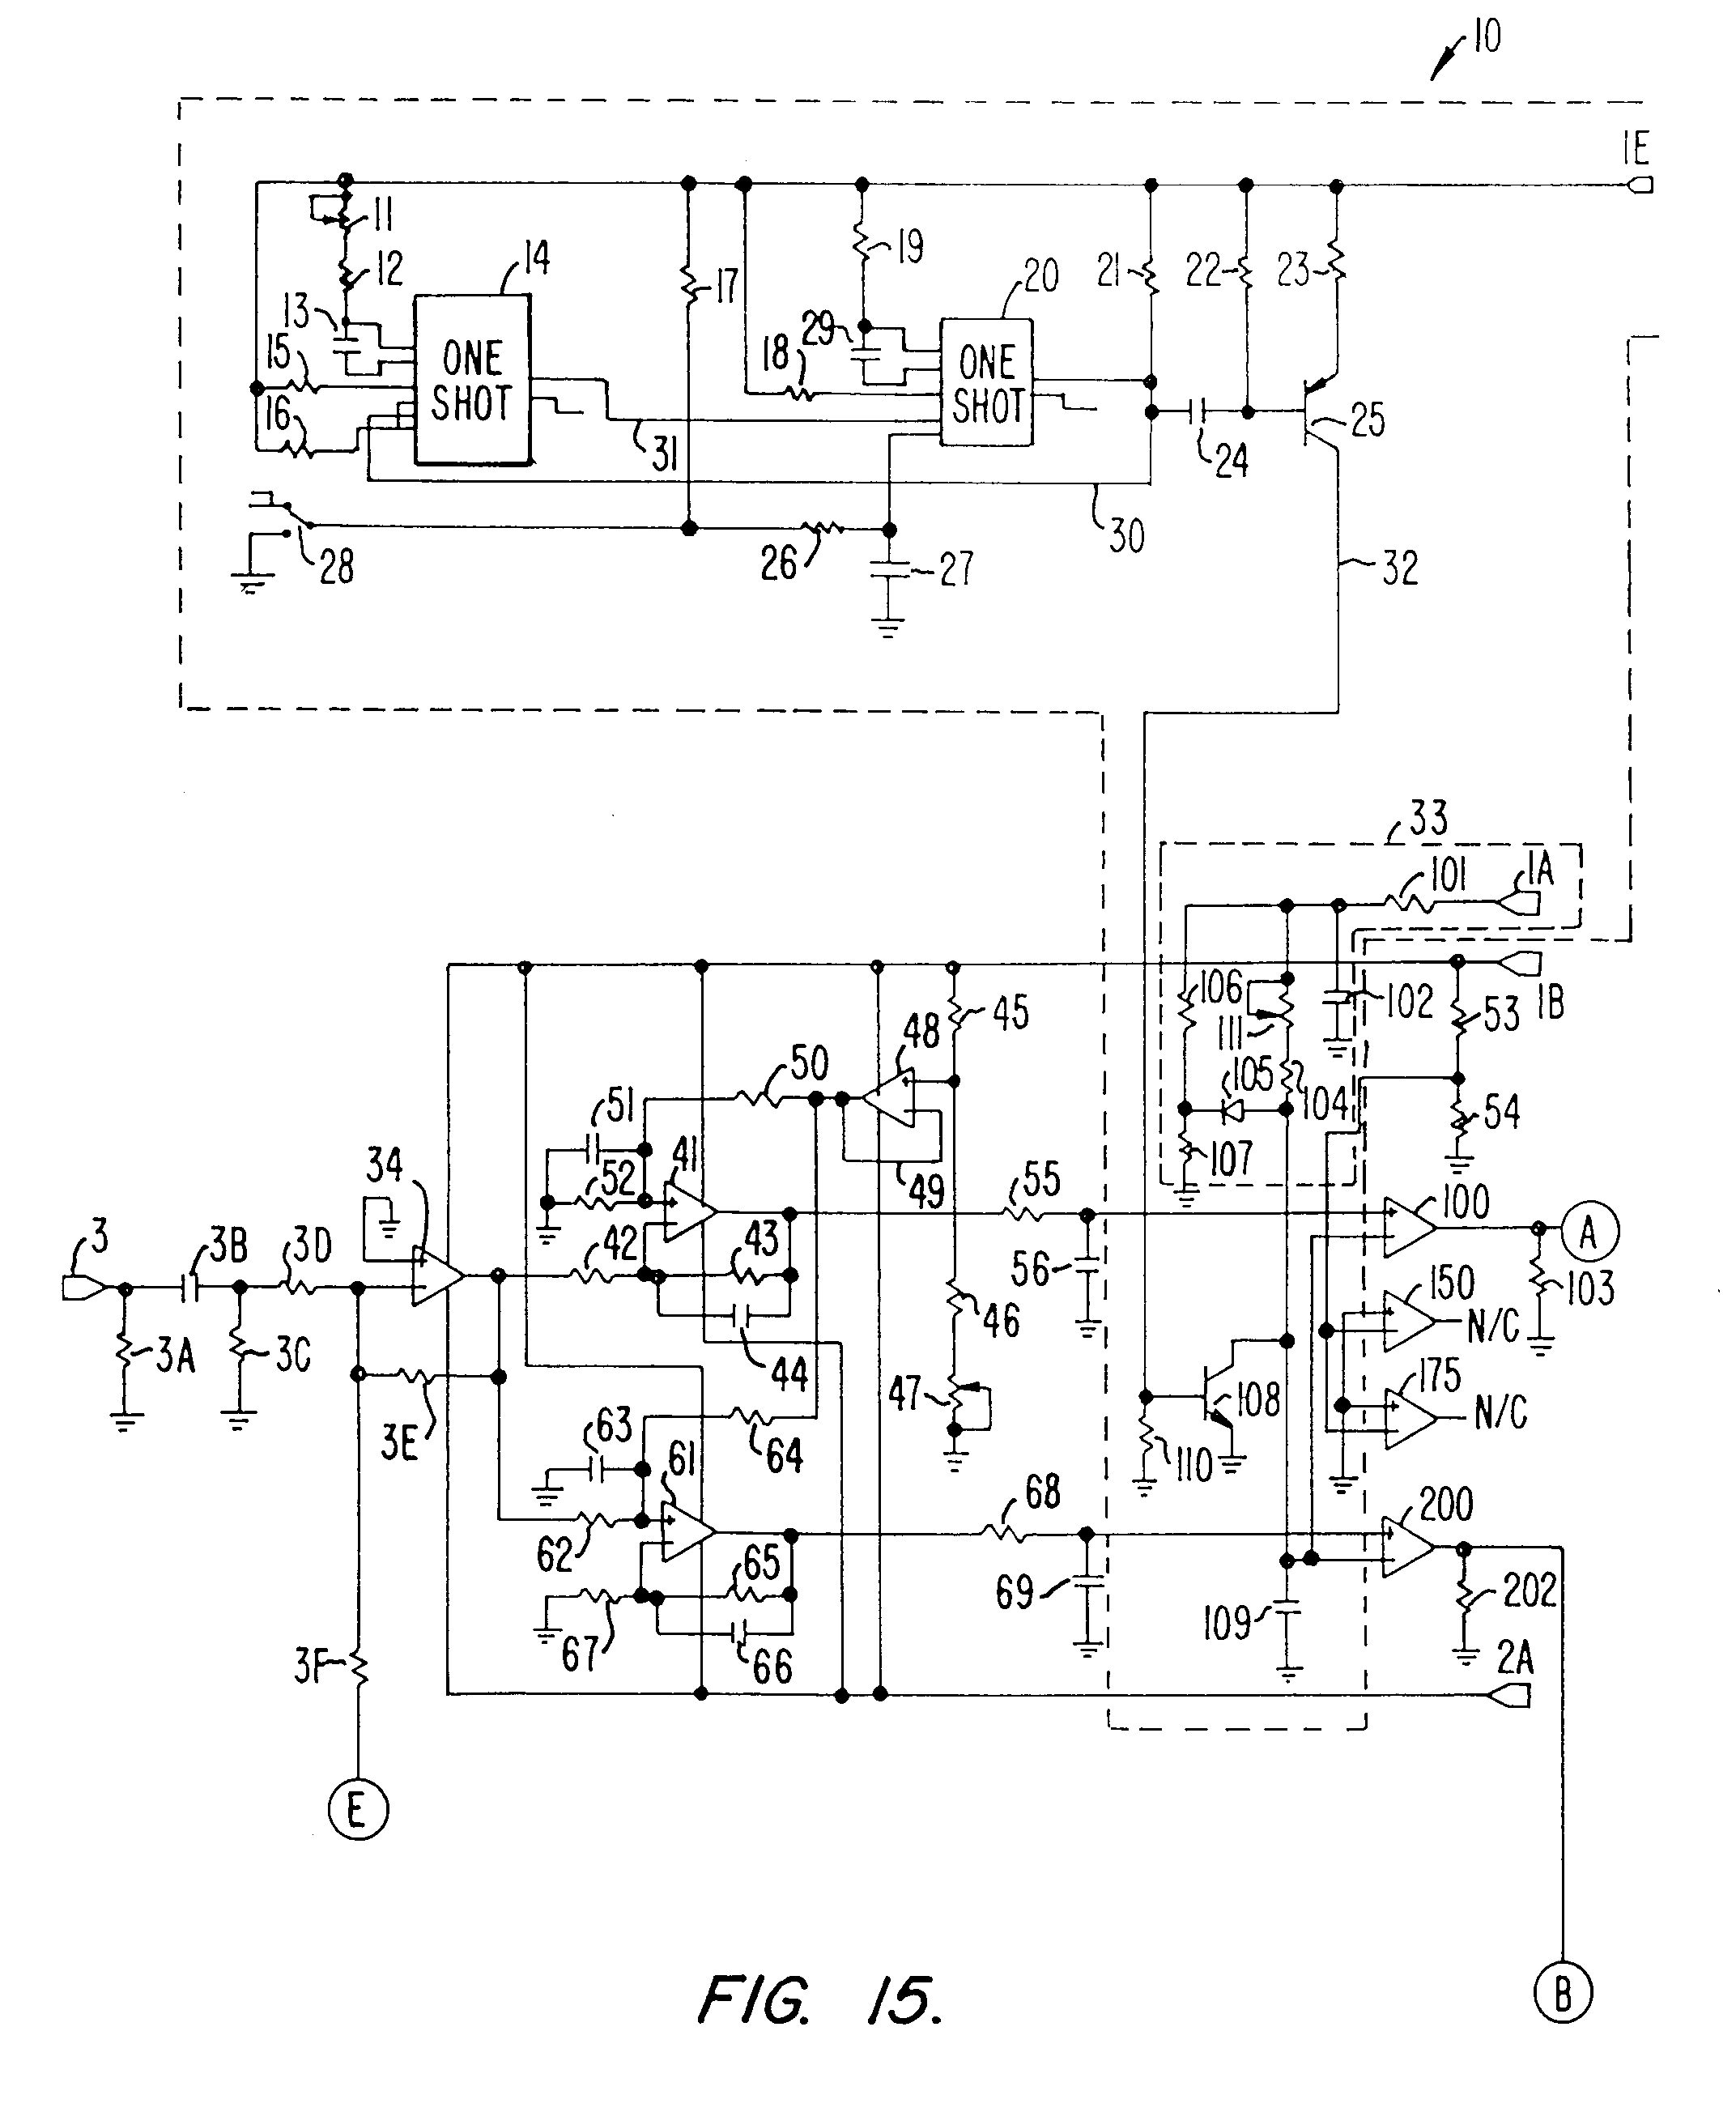 kdx 200 wiring diagram 86 kdx 200  u2022 wiring diagram